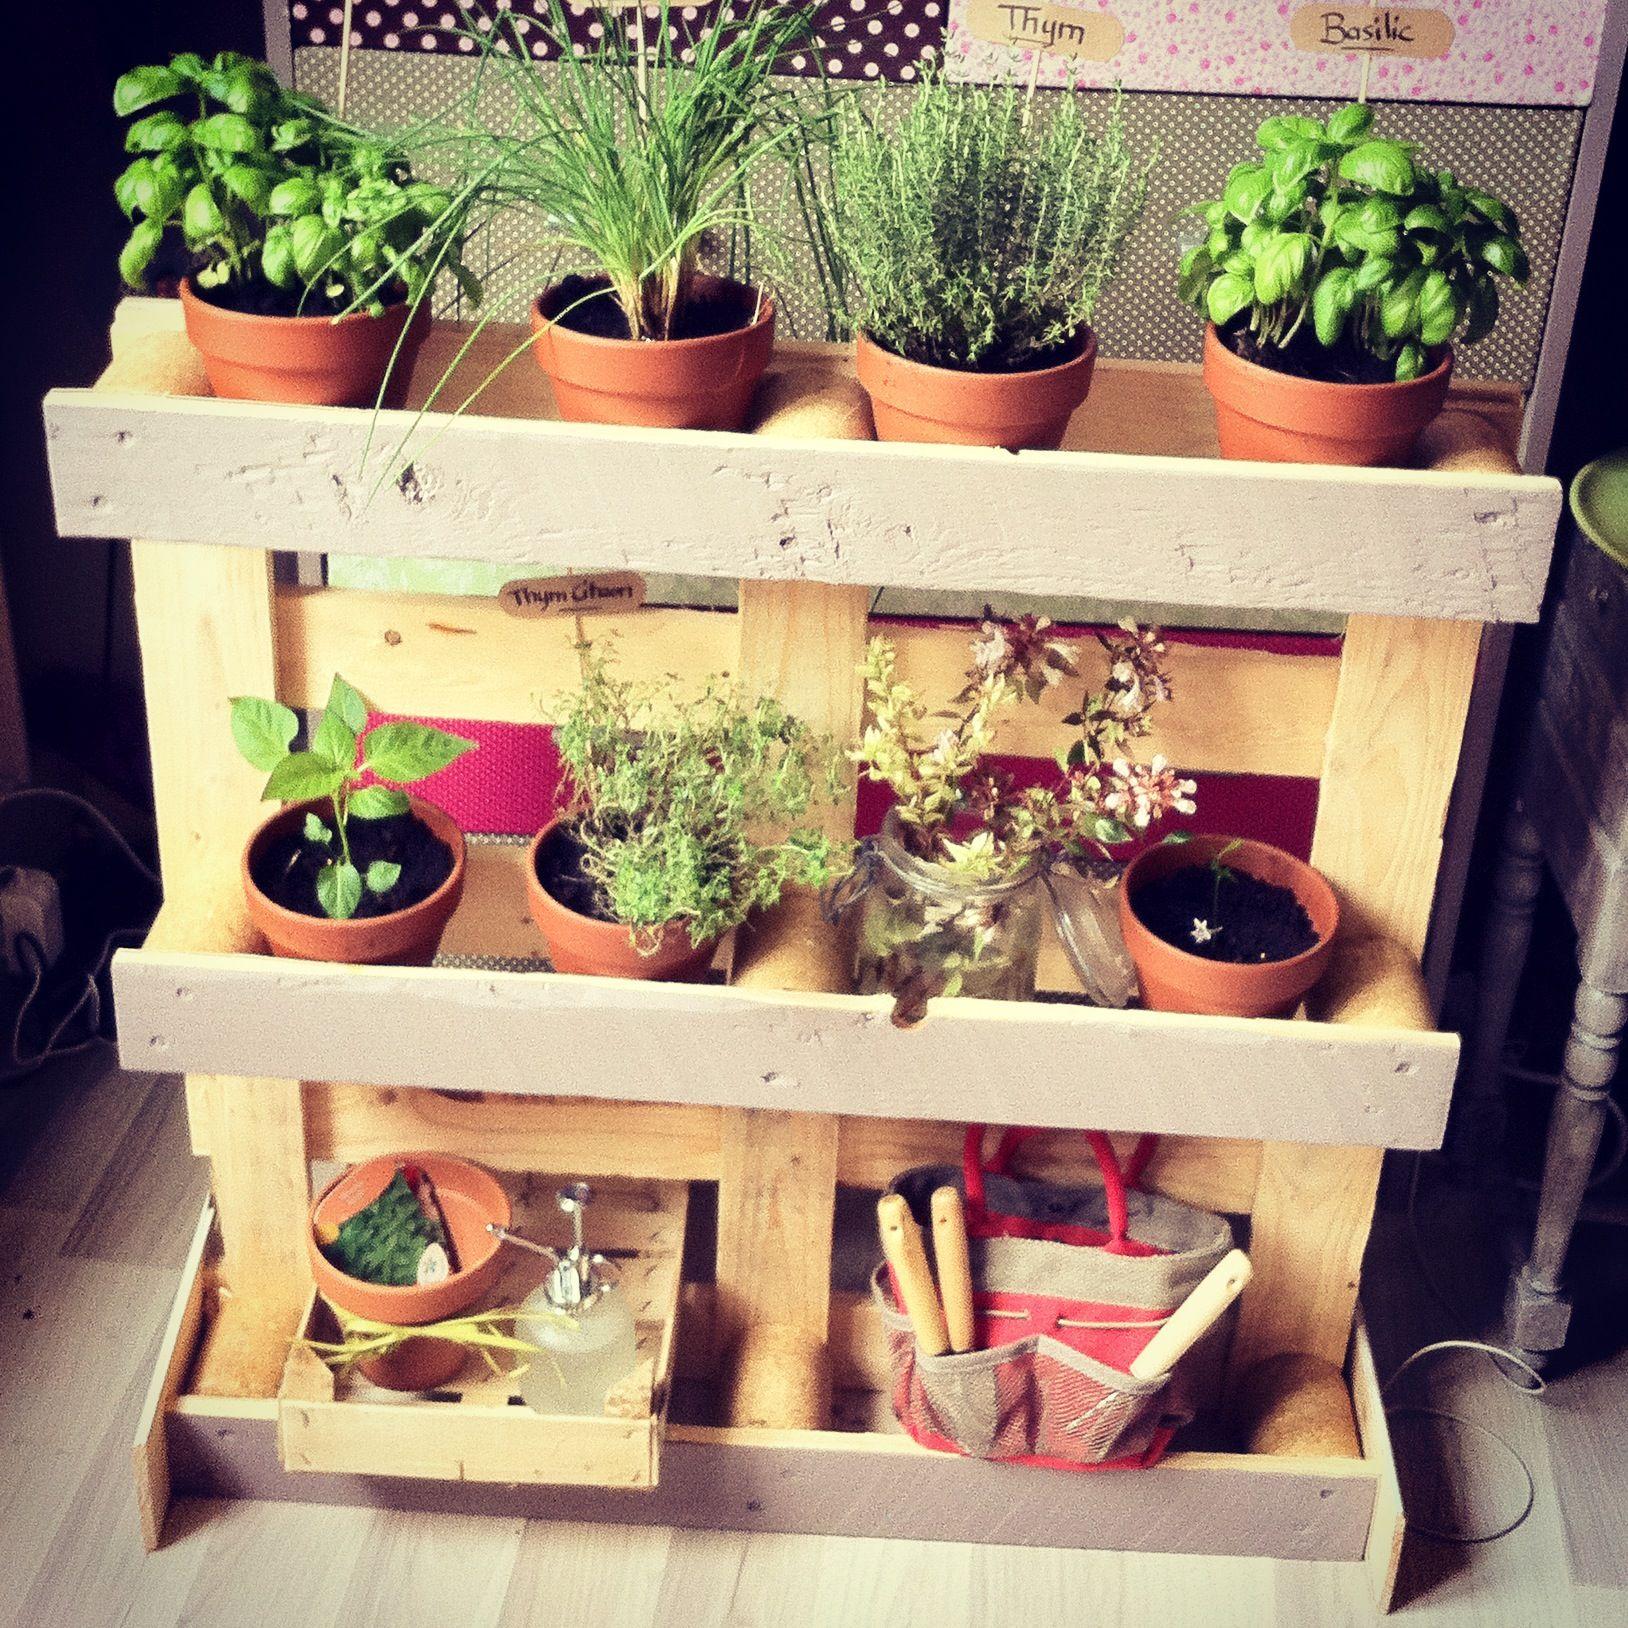 diy jardin vertical pour balcon d coration jardin pinterest. Black Bedroom Furniture Sets. Home Design Ideas